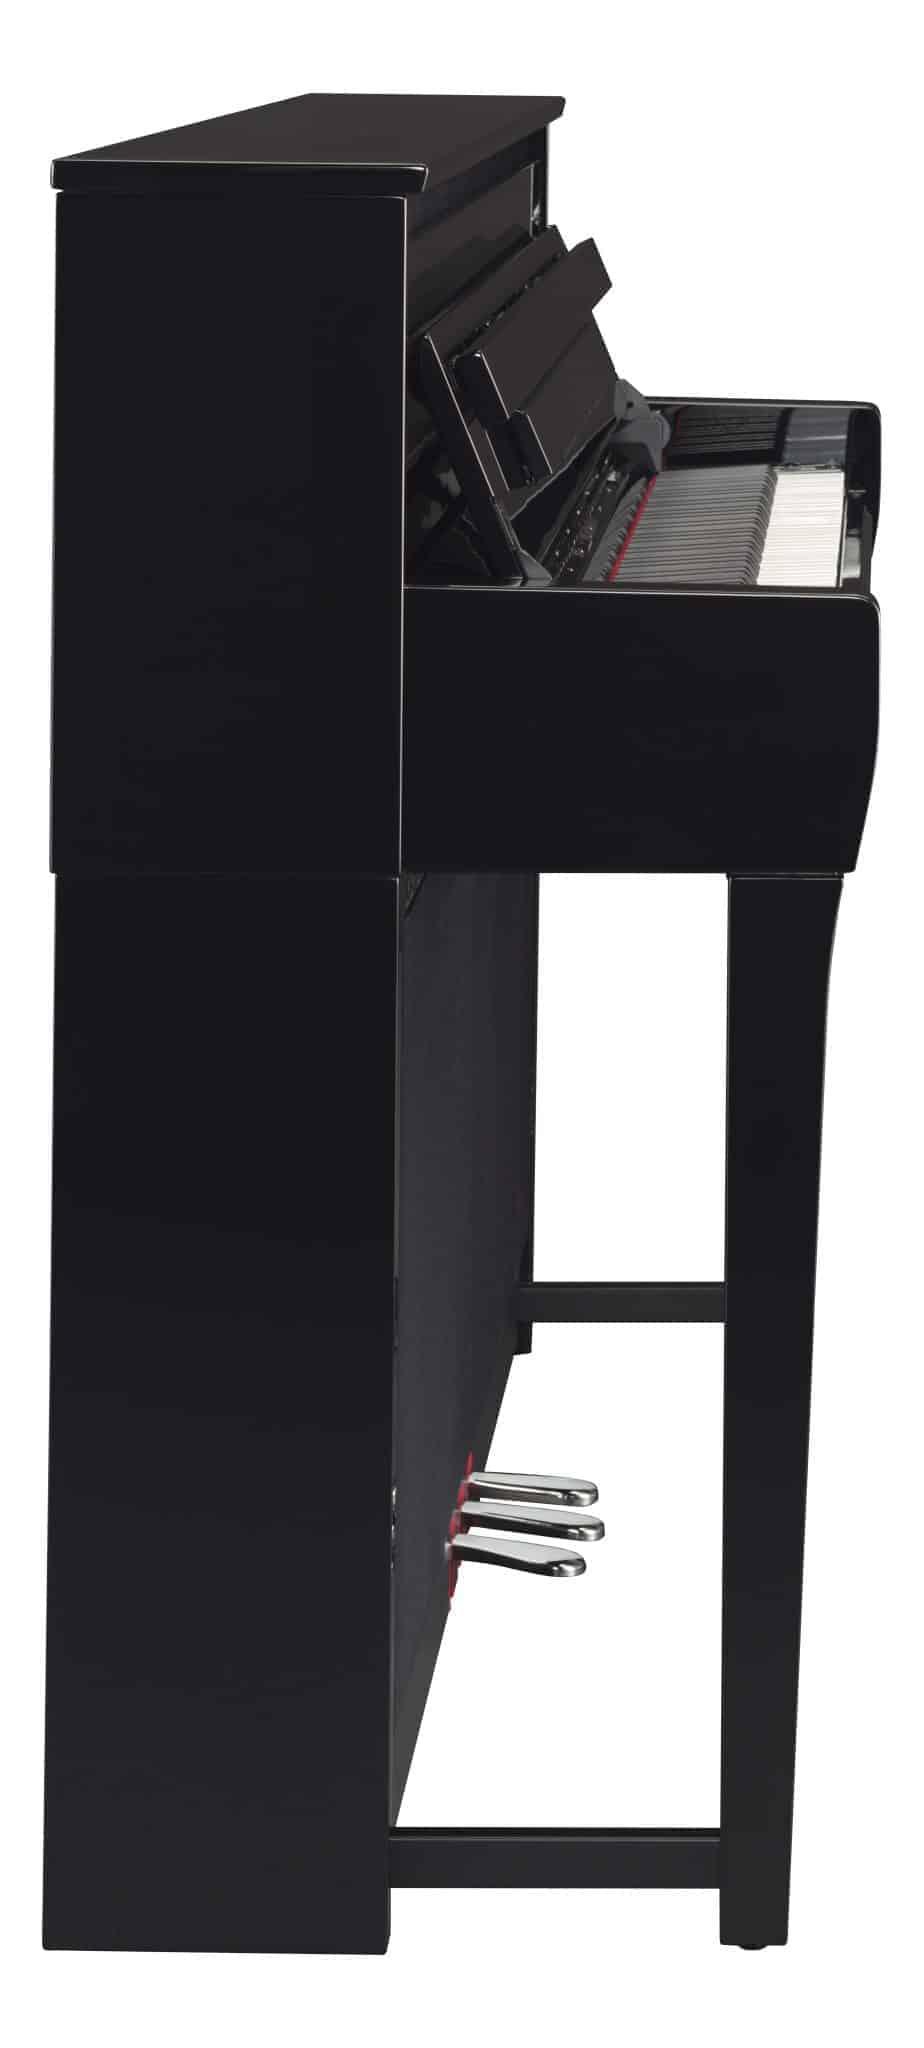 yamaha clp 685 clavinova premier digital piano piano gallery of utah. Black Bedroom Furniture Sets. Home Design Ideas